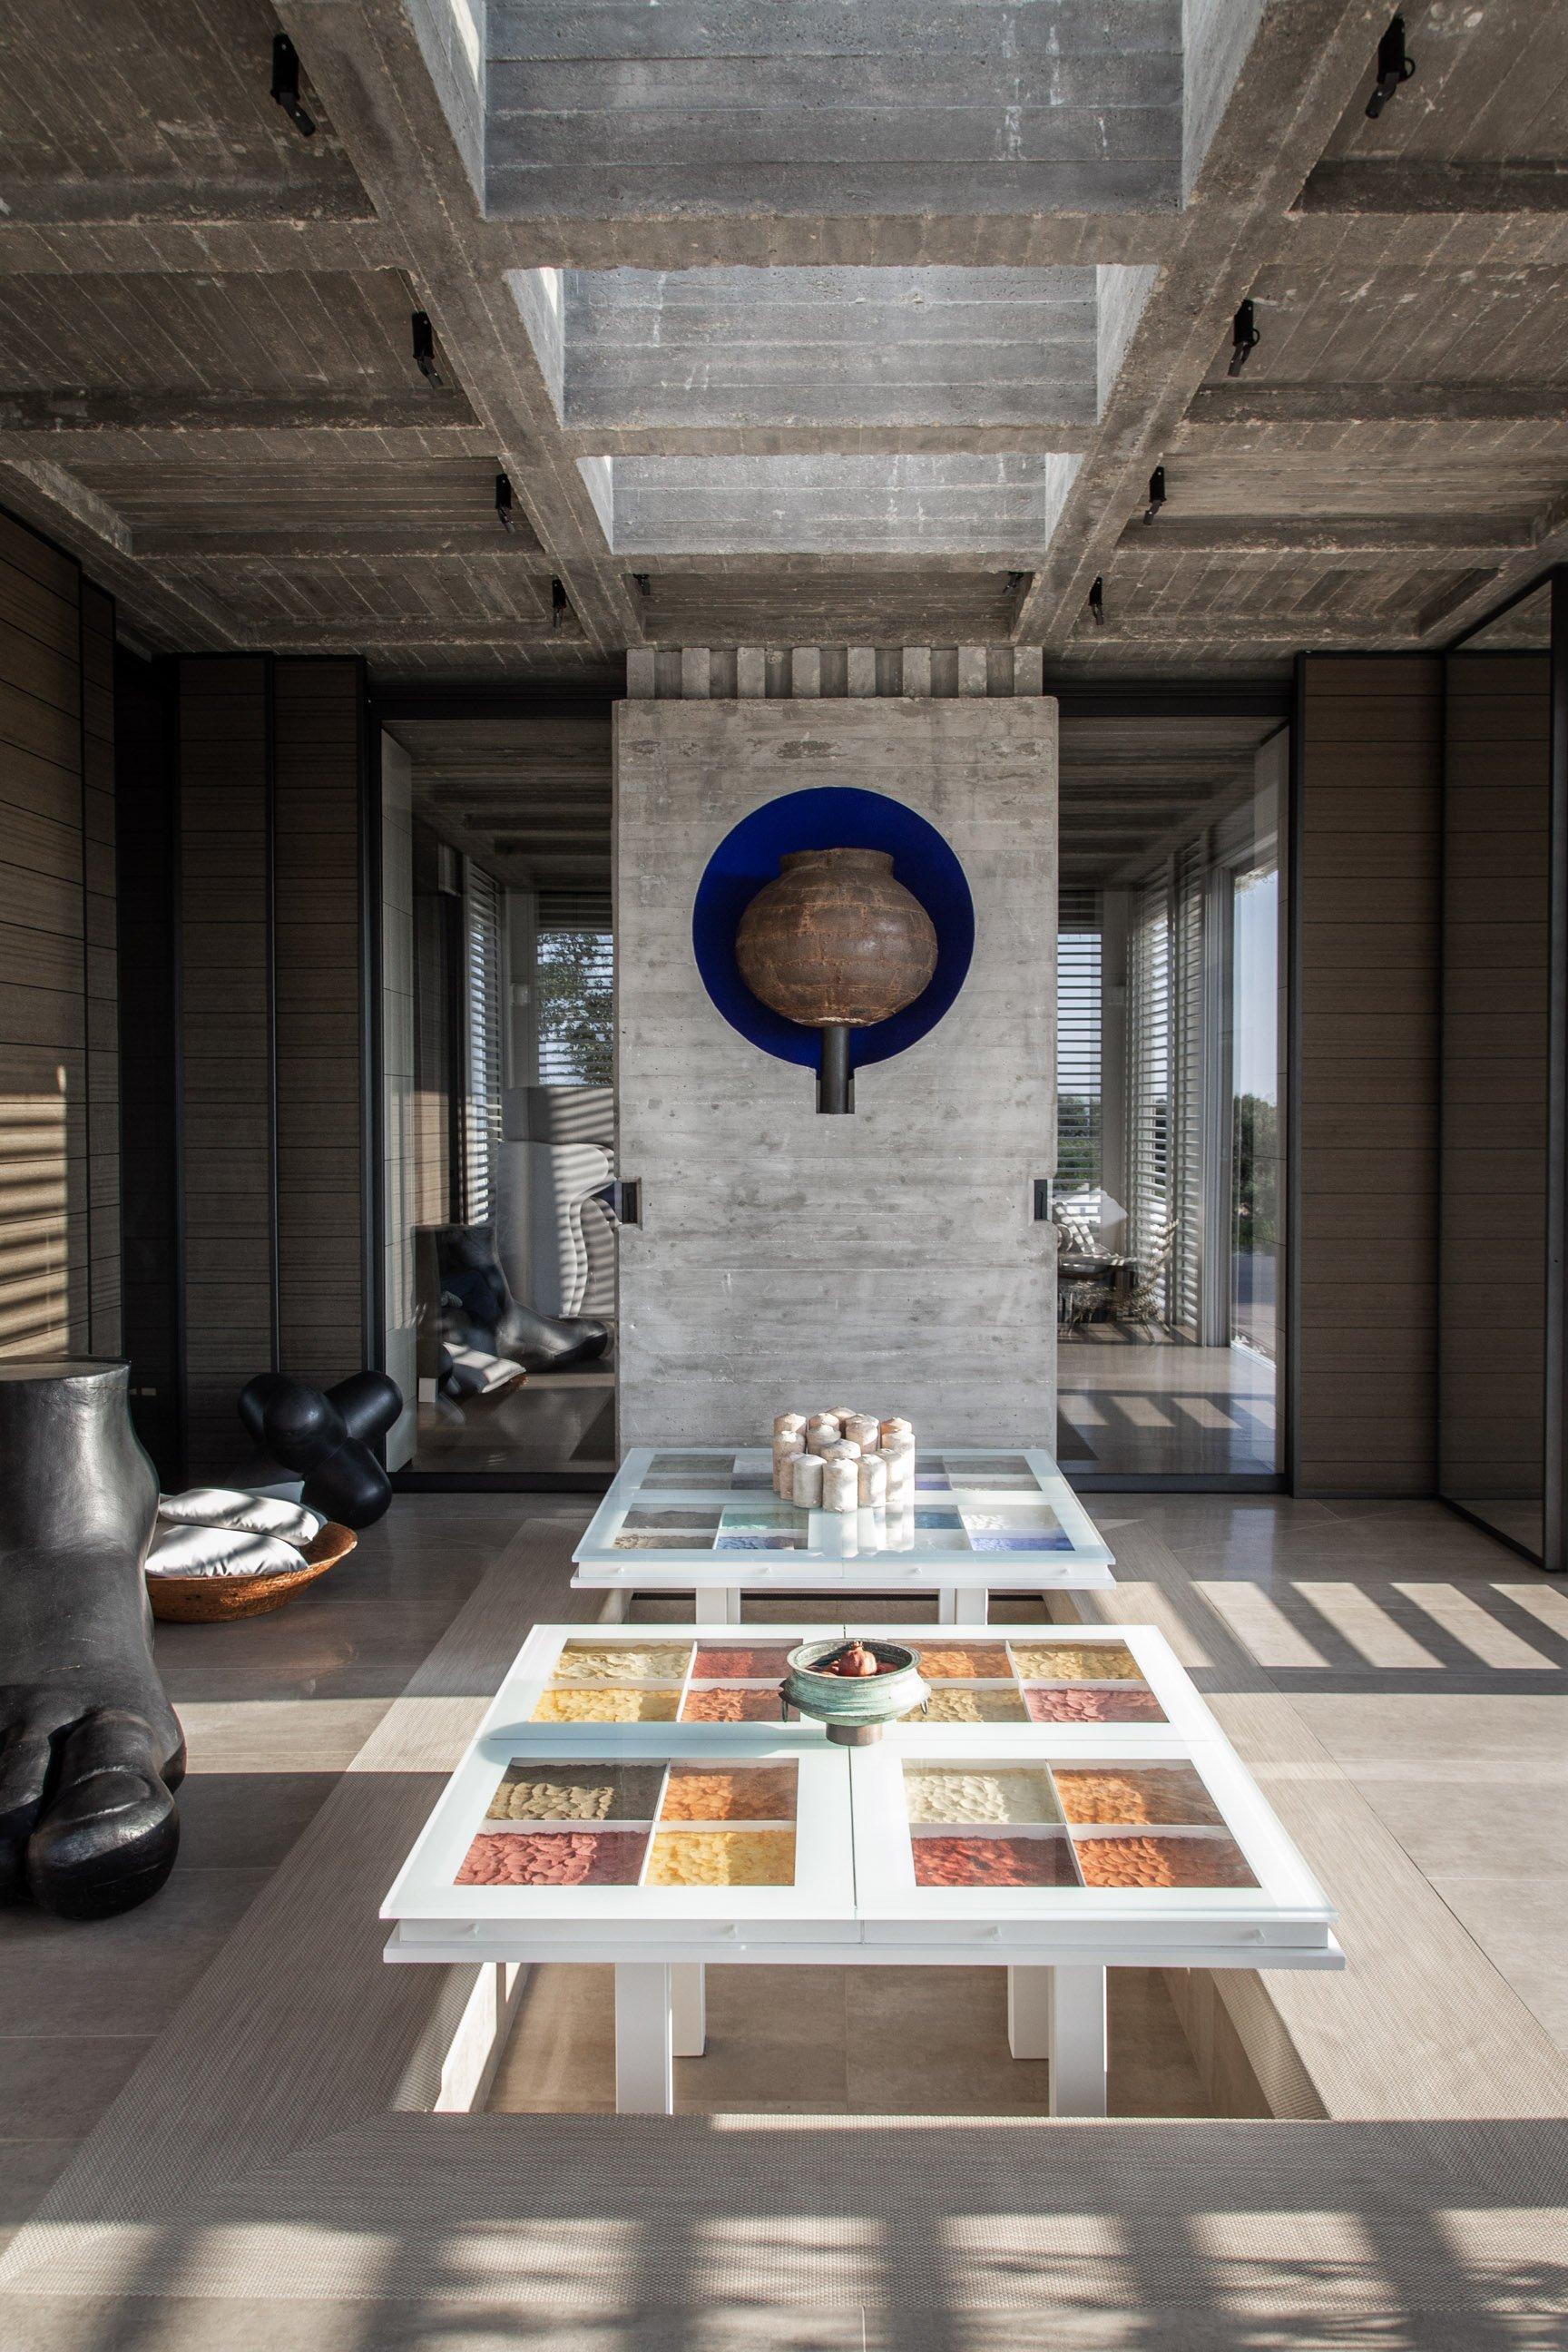 architettura simmetrica